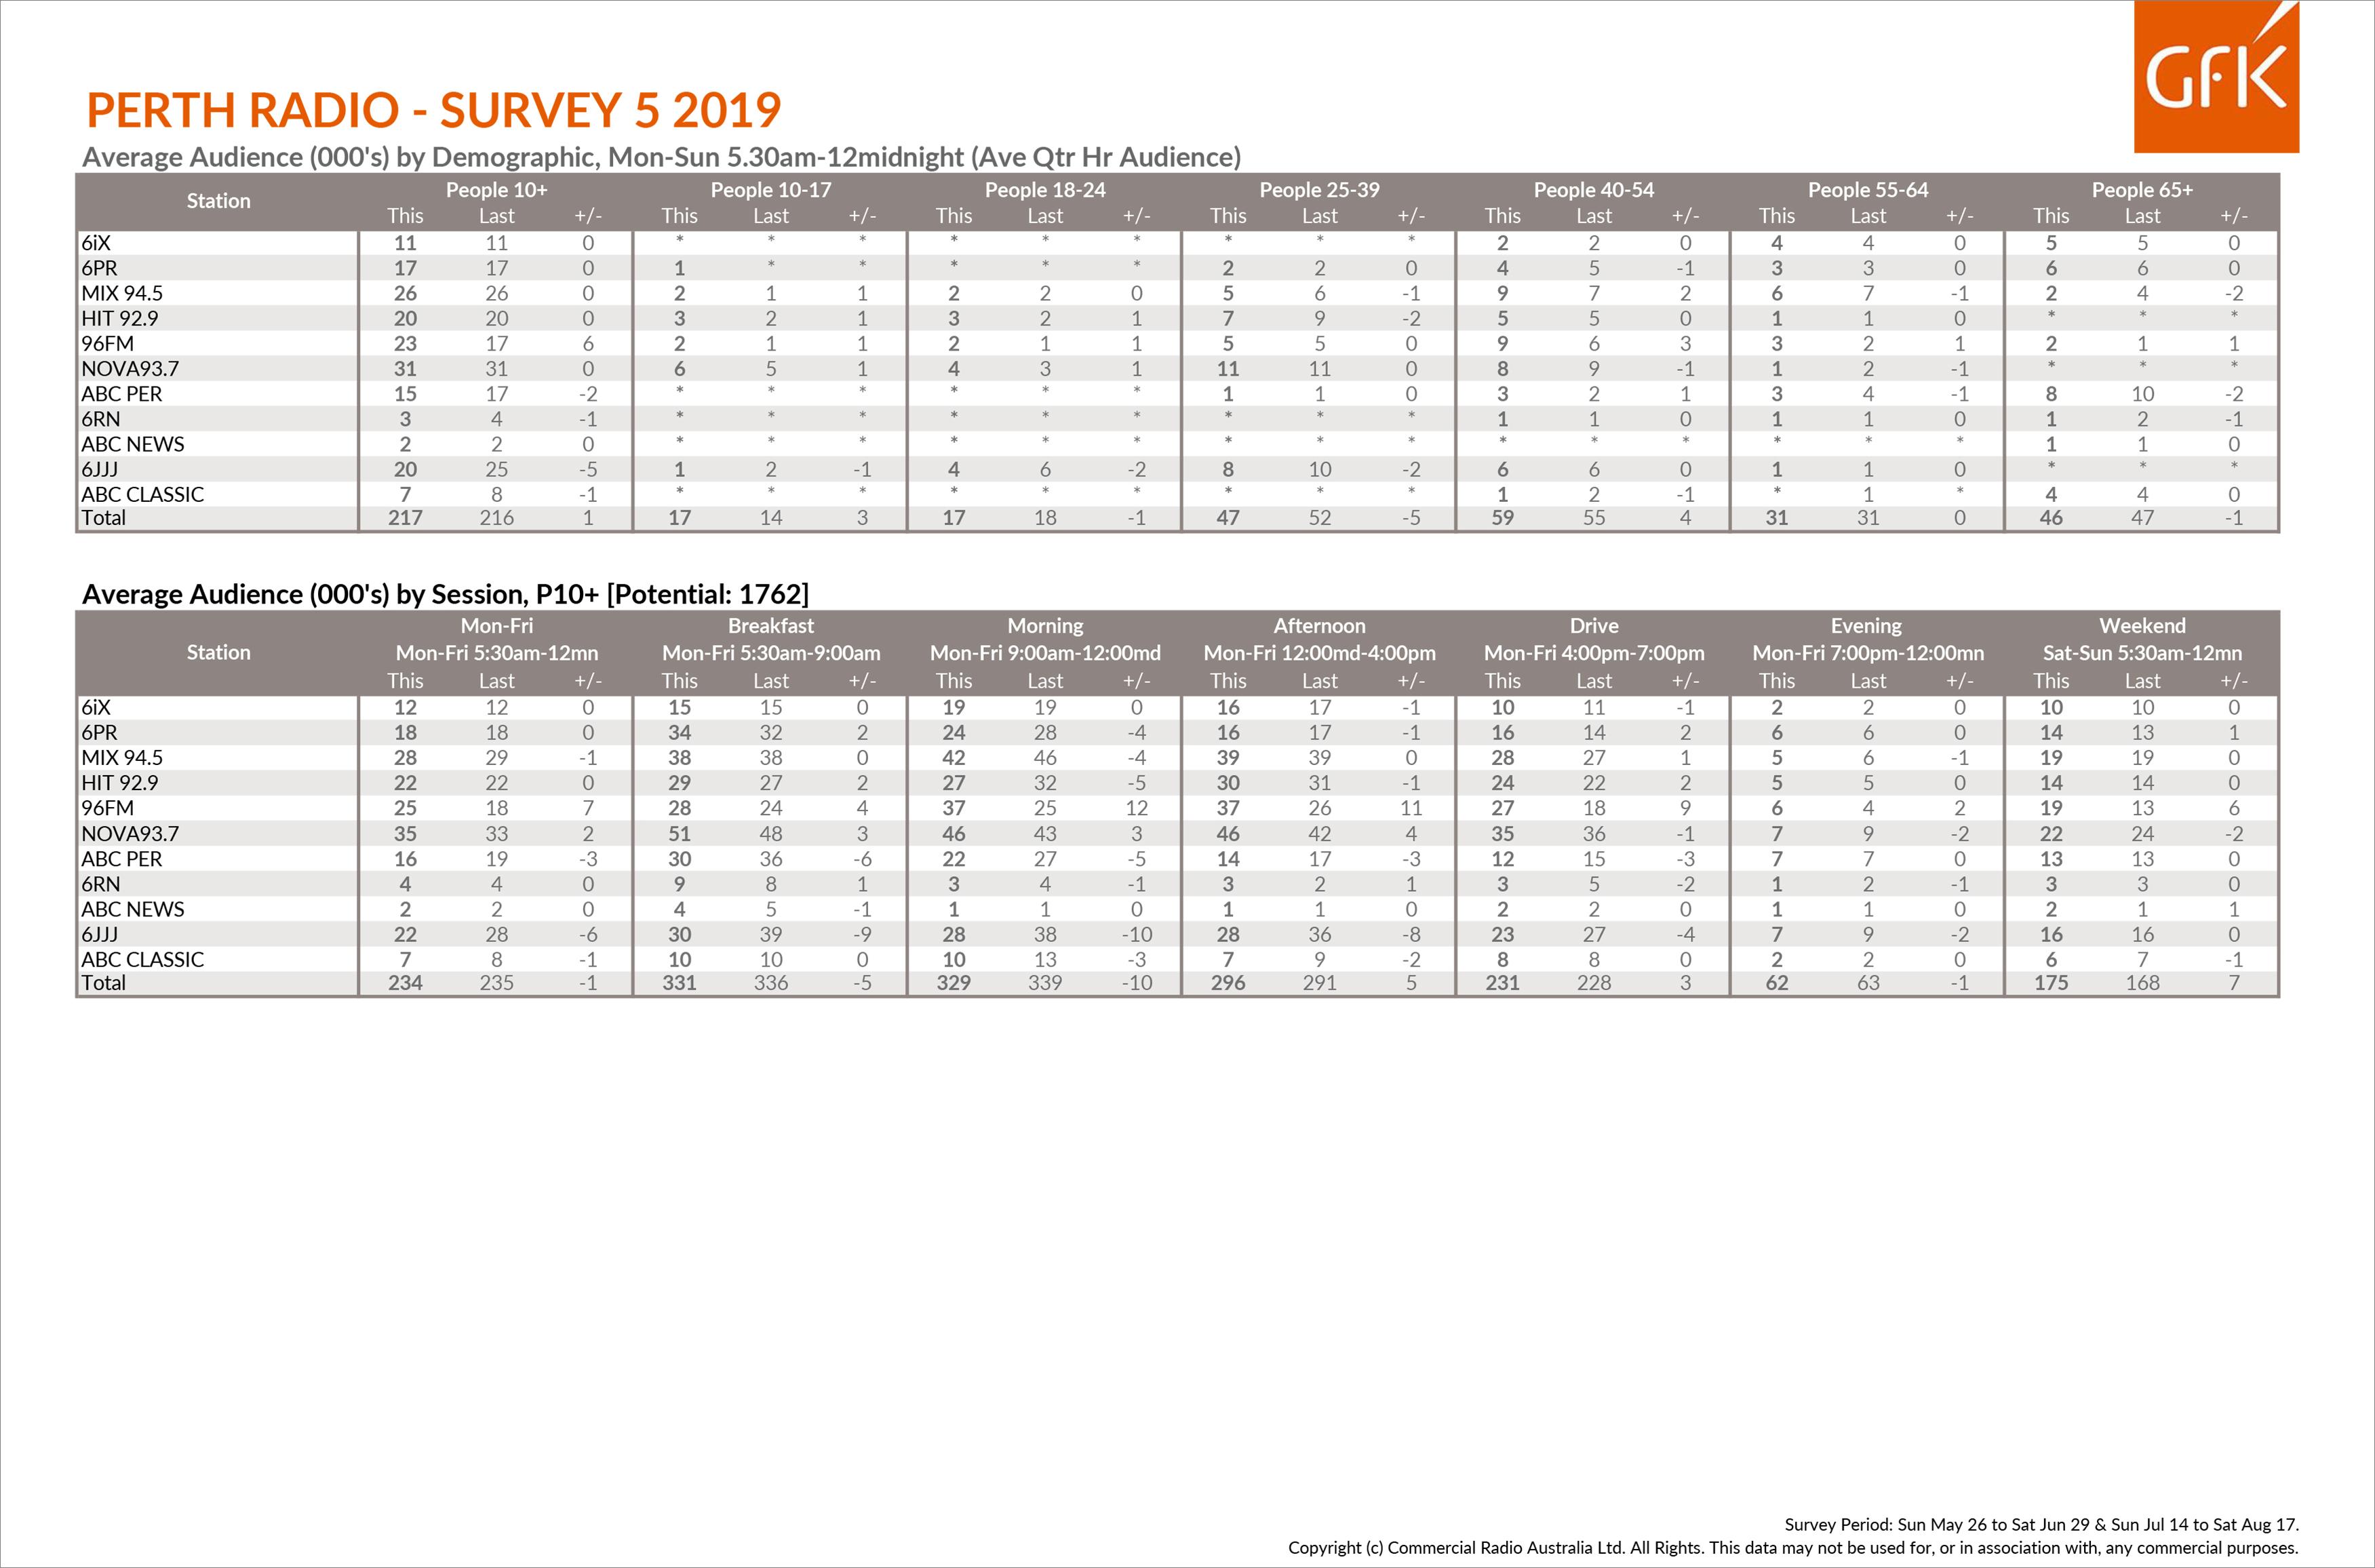 Nova 93.7 dominates but 96fm makes big gains in Perth Radio Survey 5 2019